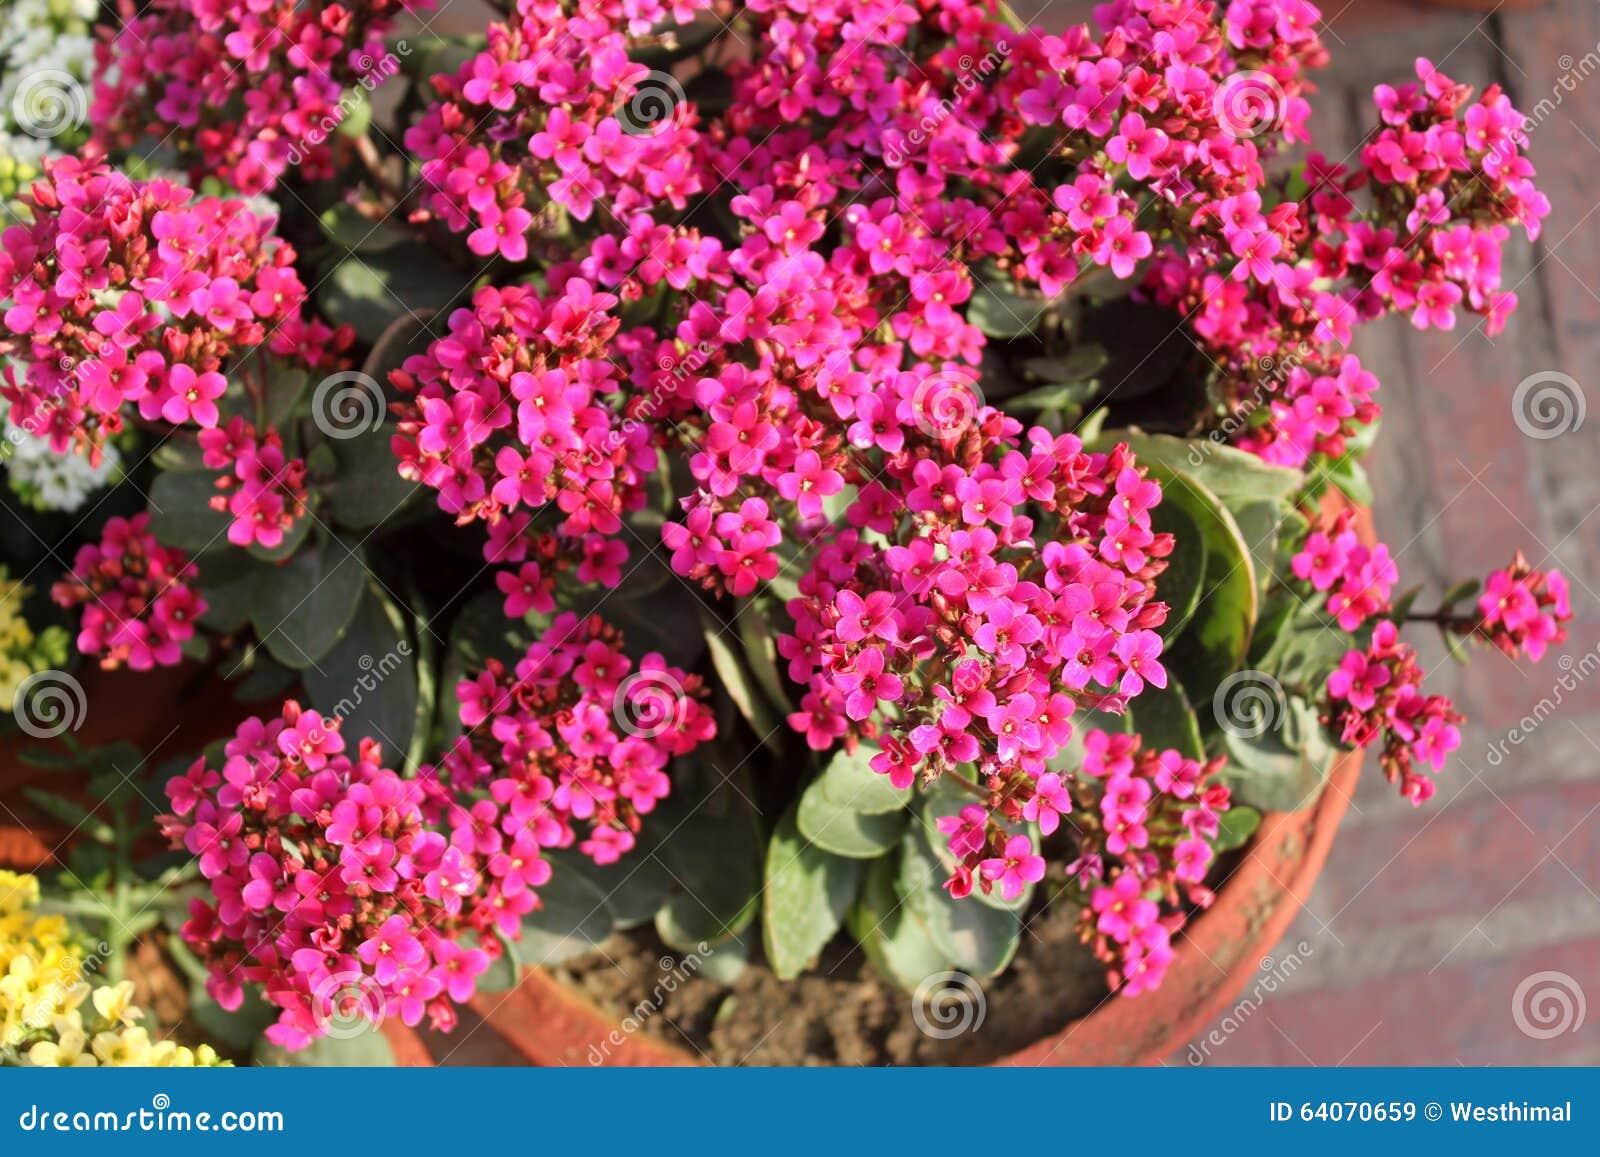 Kalanchoe Blossfeldiana Pink Stock Image Image Of Small Pink